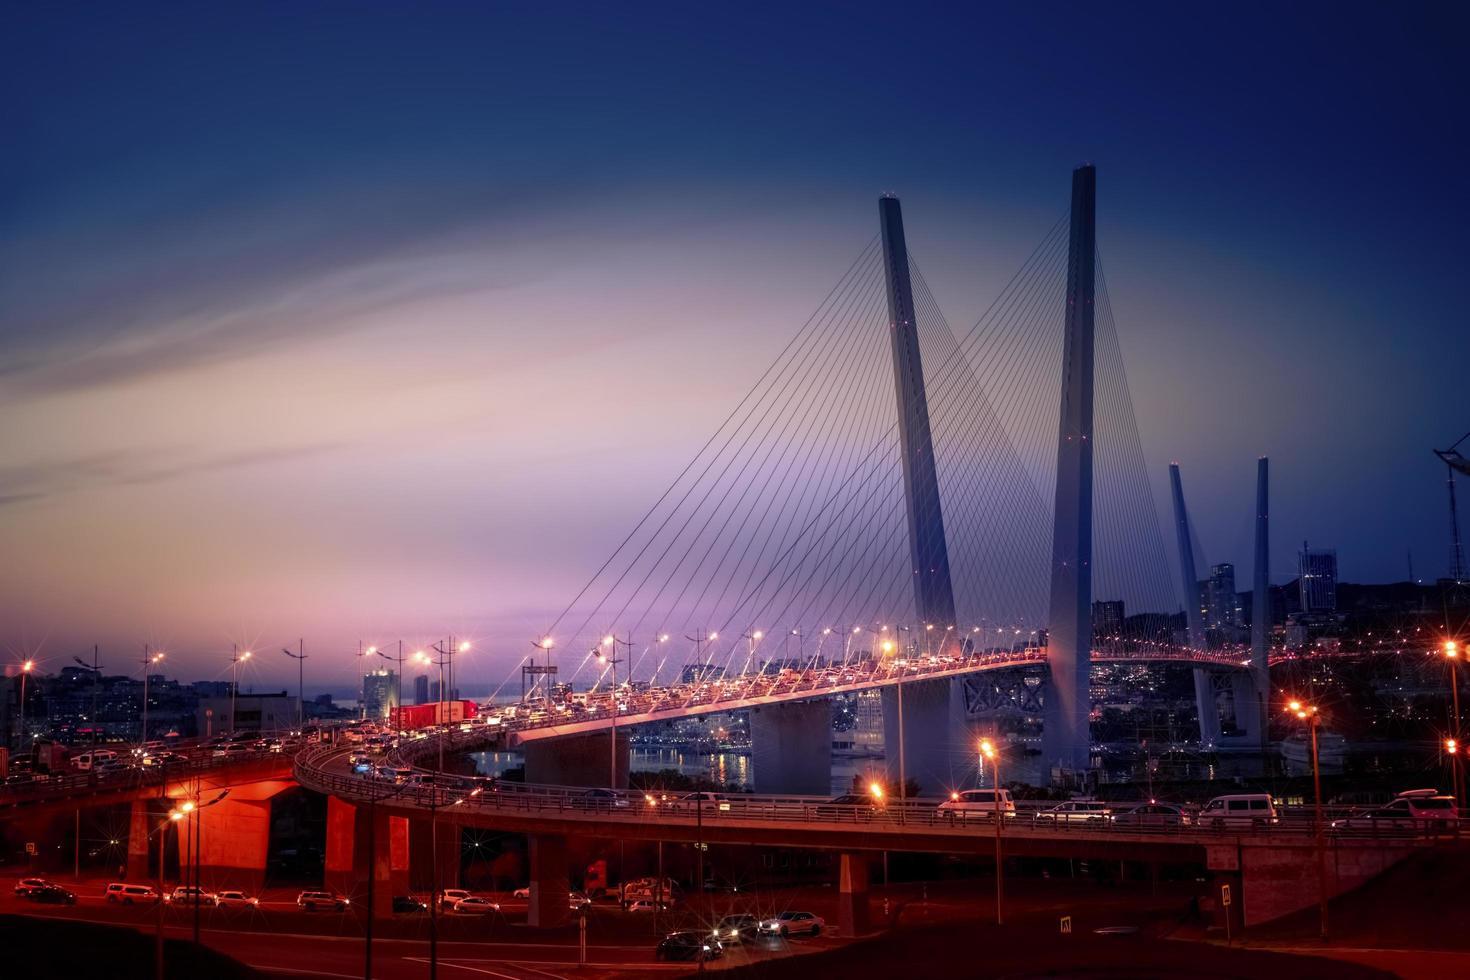 Nachtstadtbild mit Zolotoybrücke in Wladiwostok, Russland foto